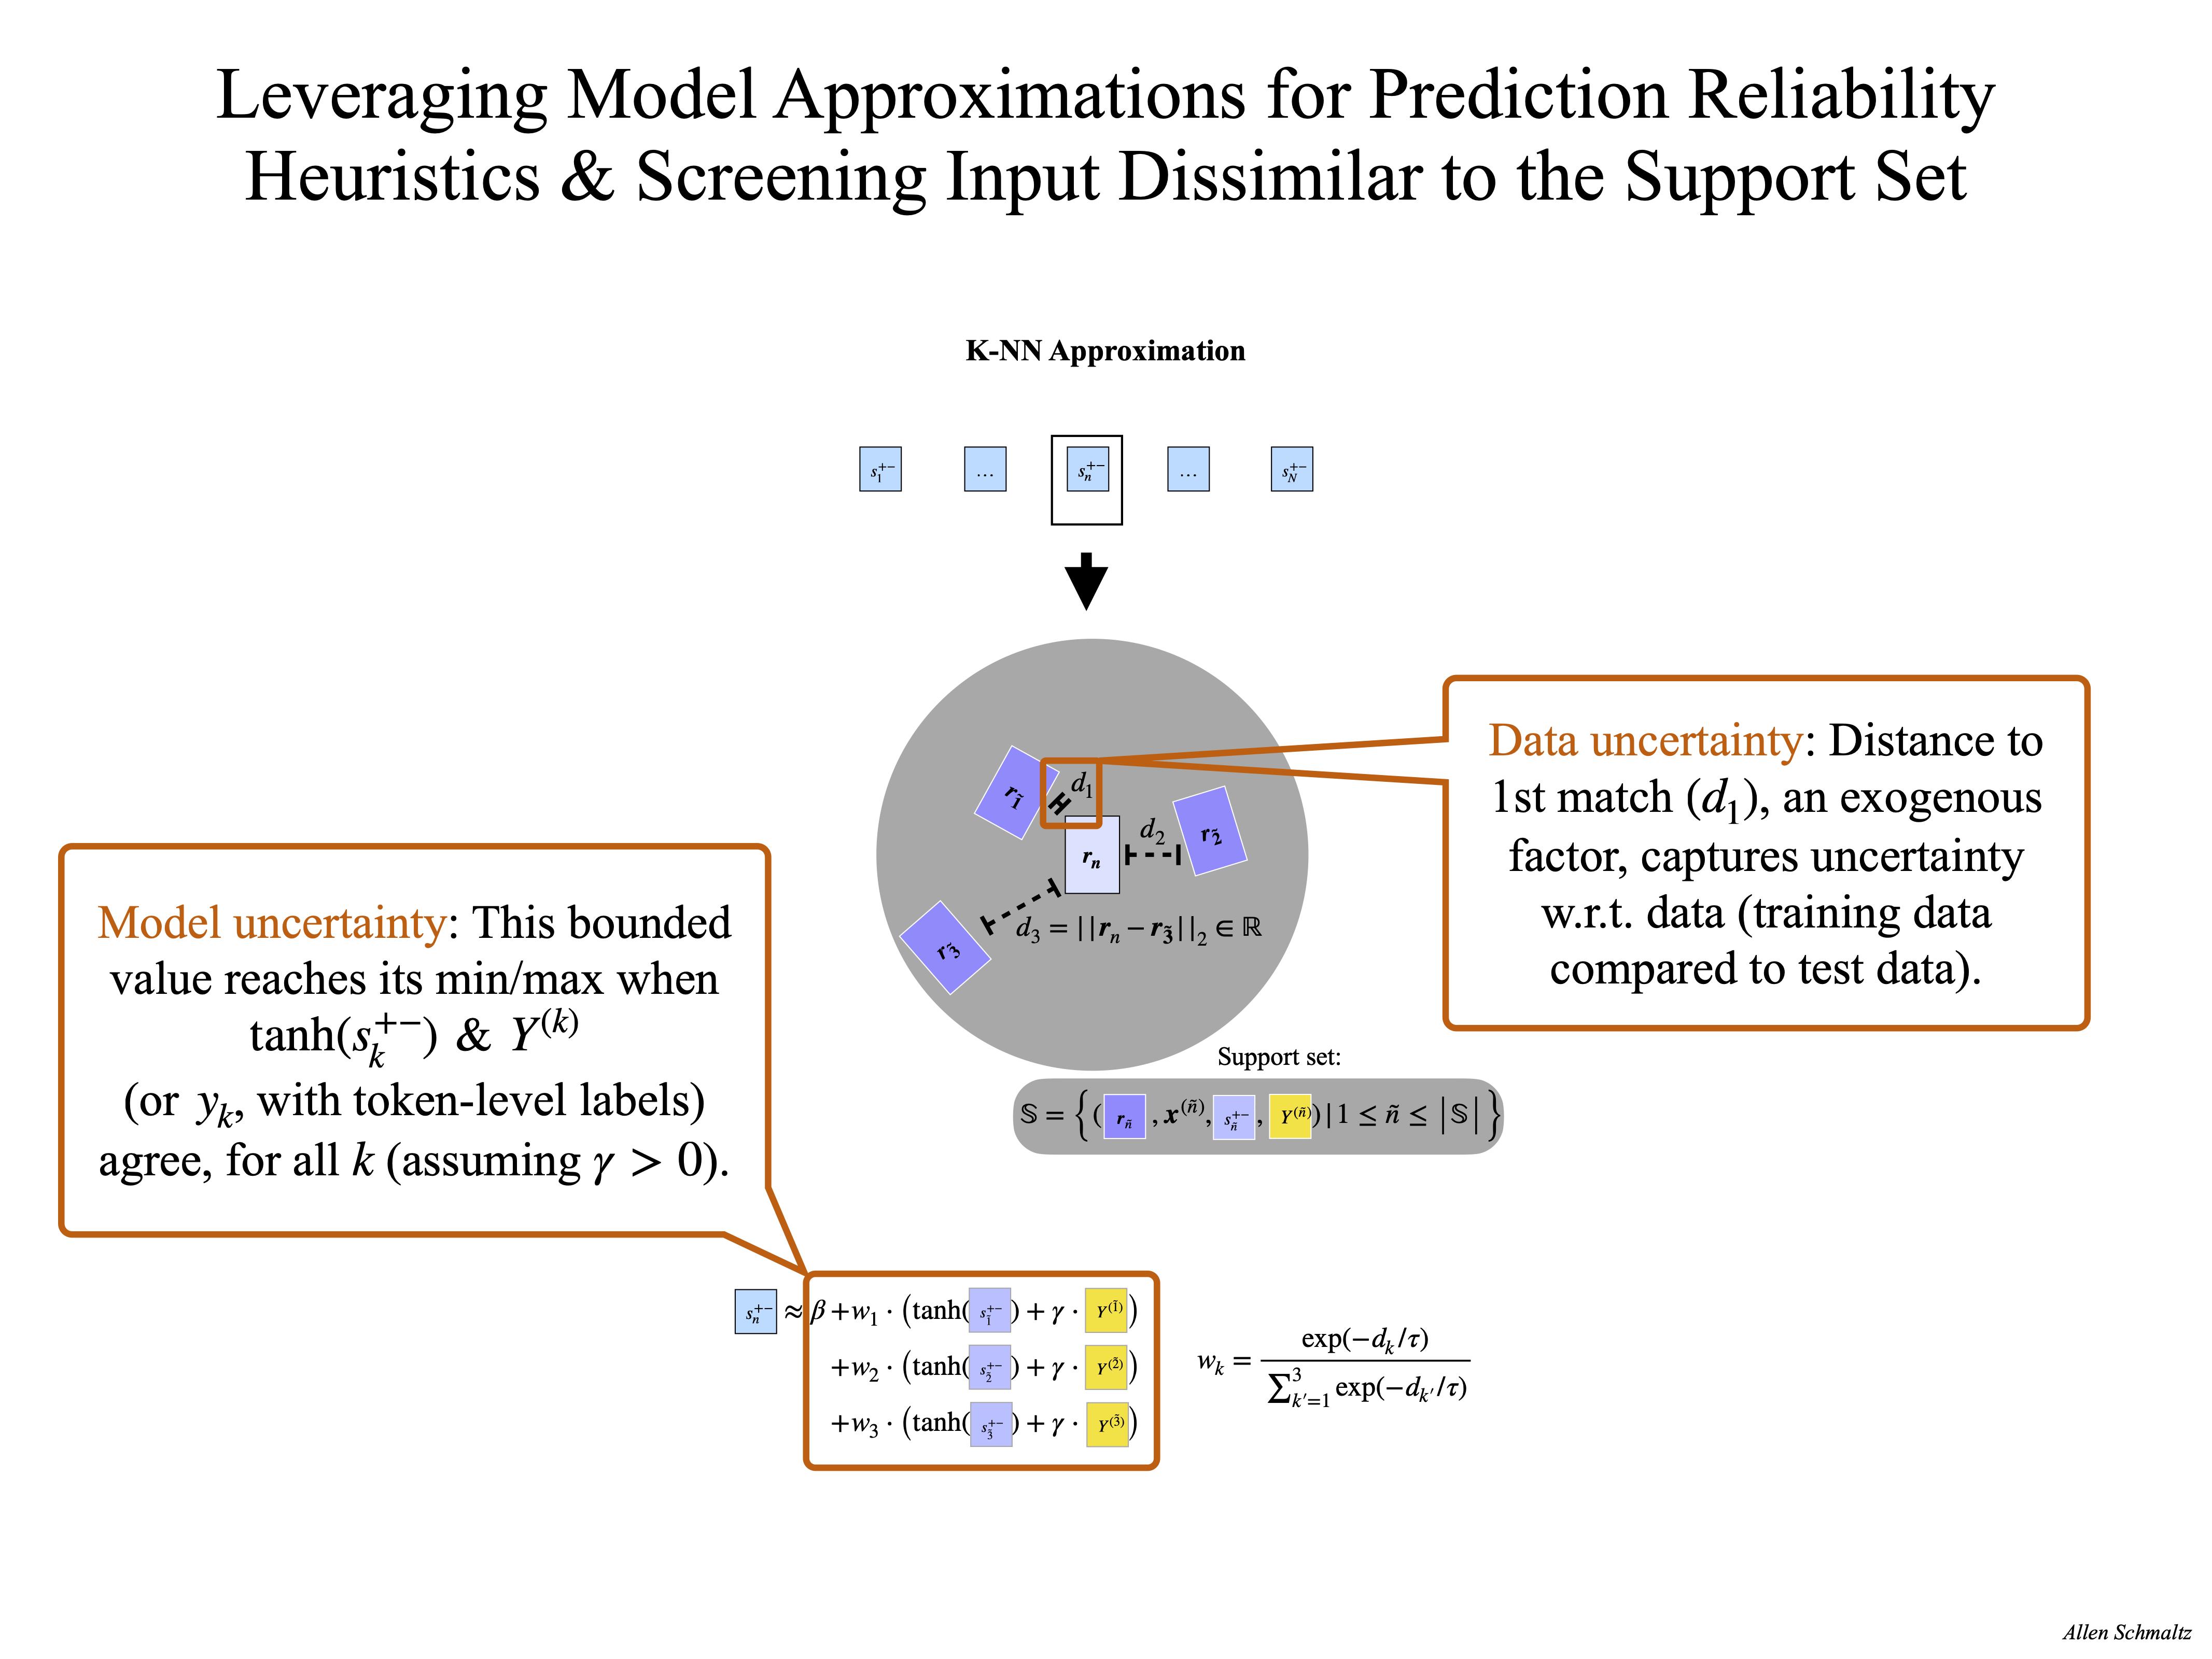 Prediction Reliability Heuristics